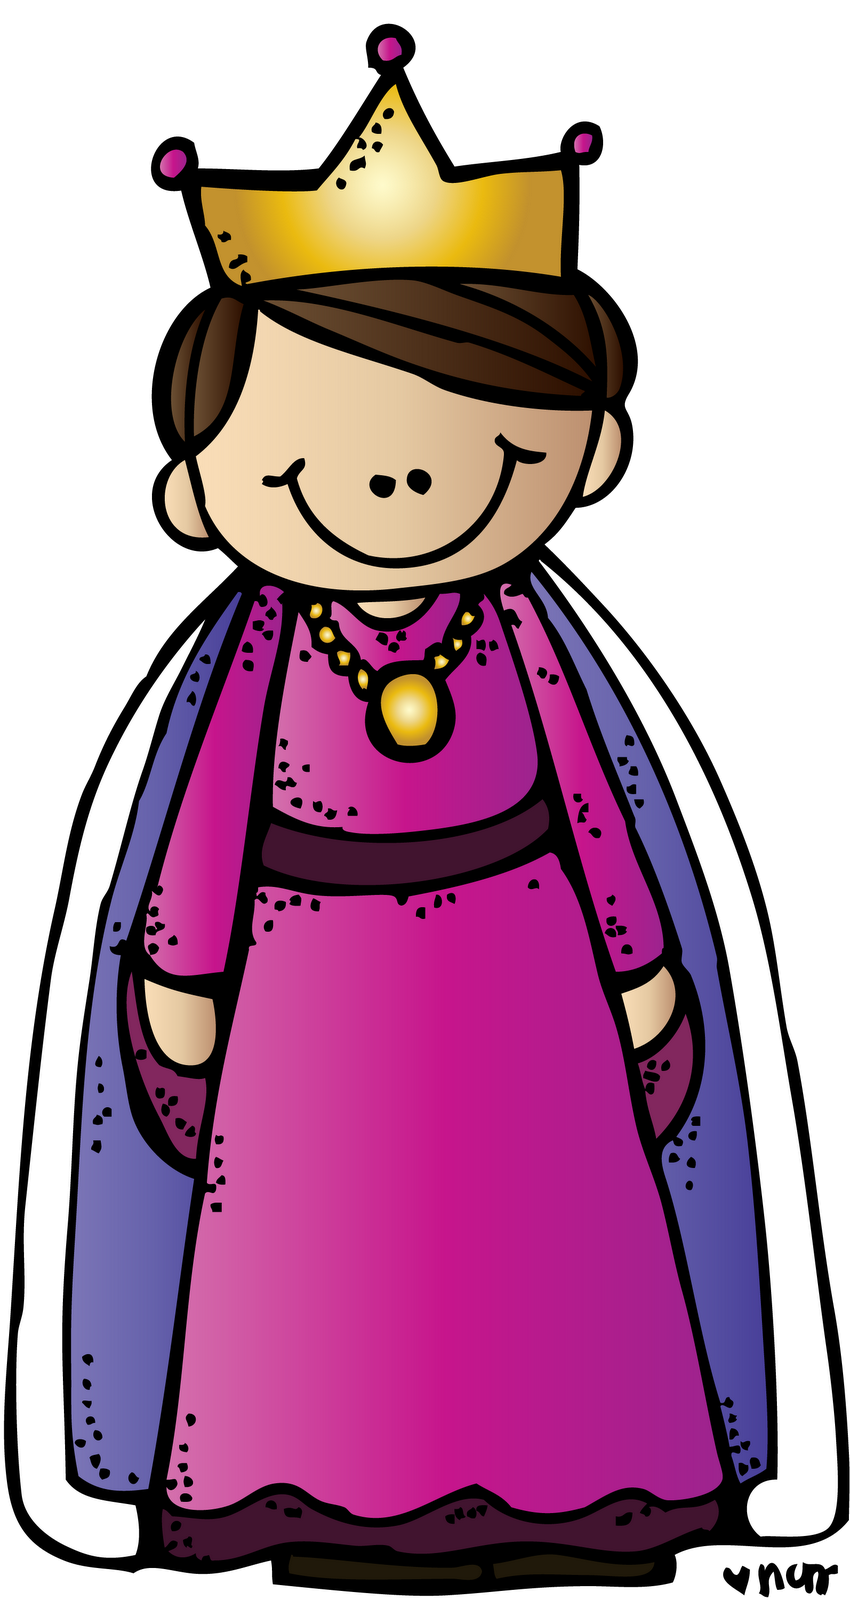 queen elizabeth cartoon clipart - photo #24